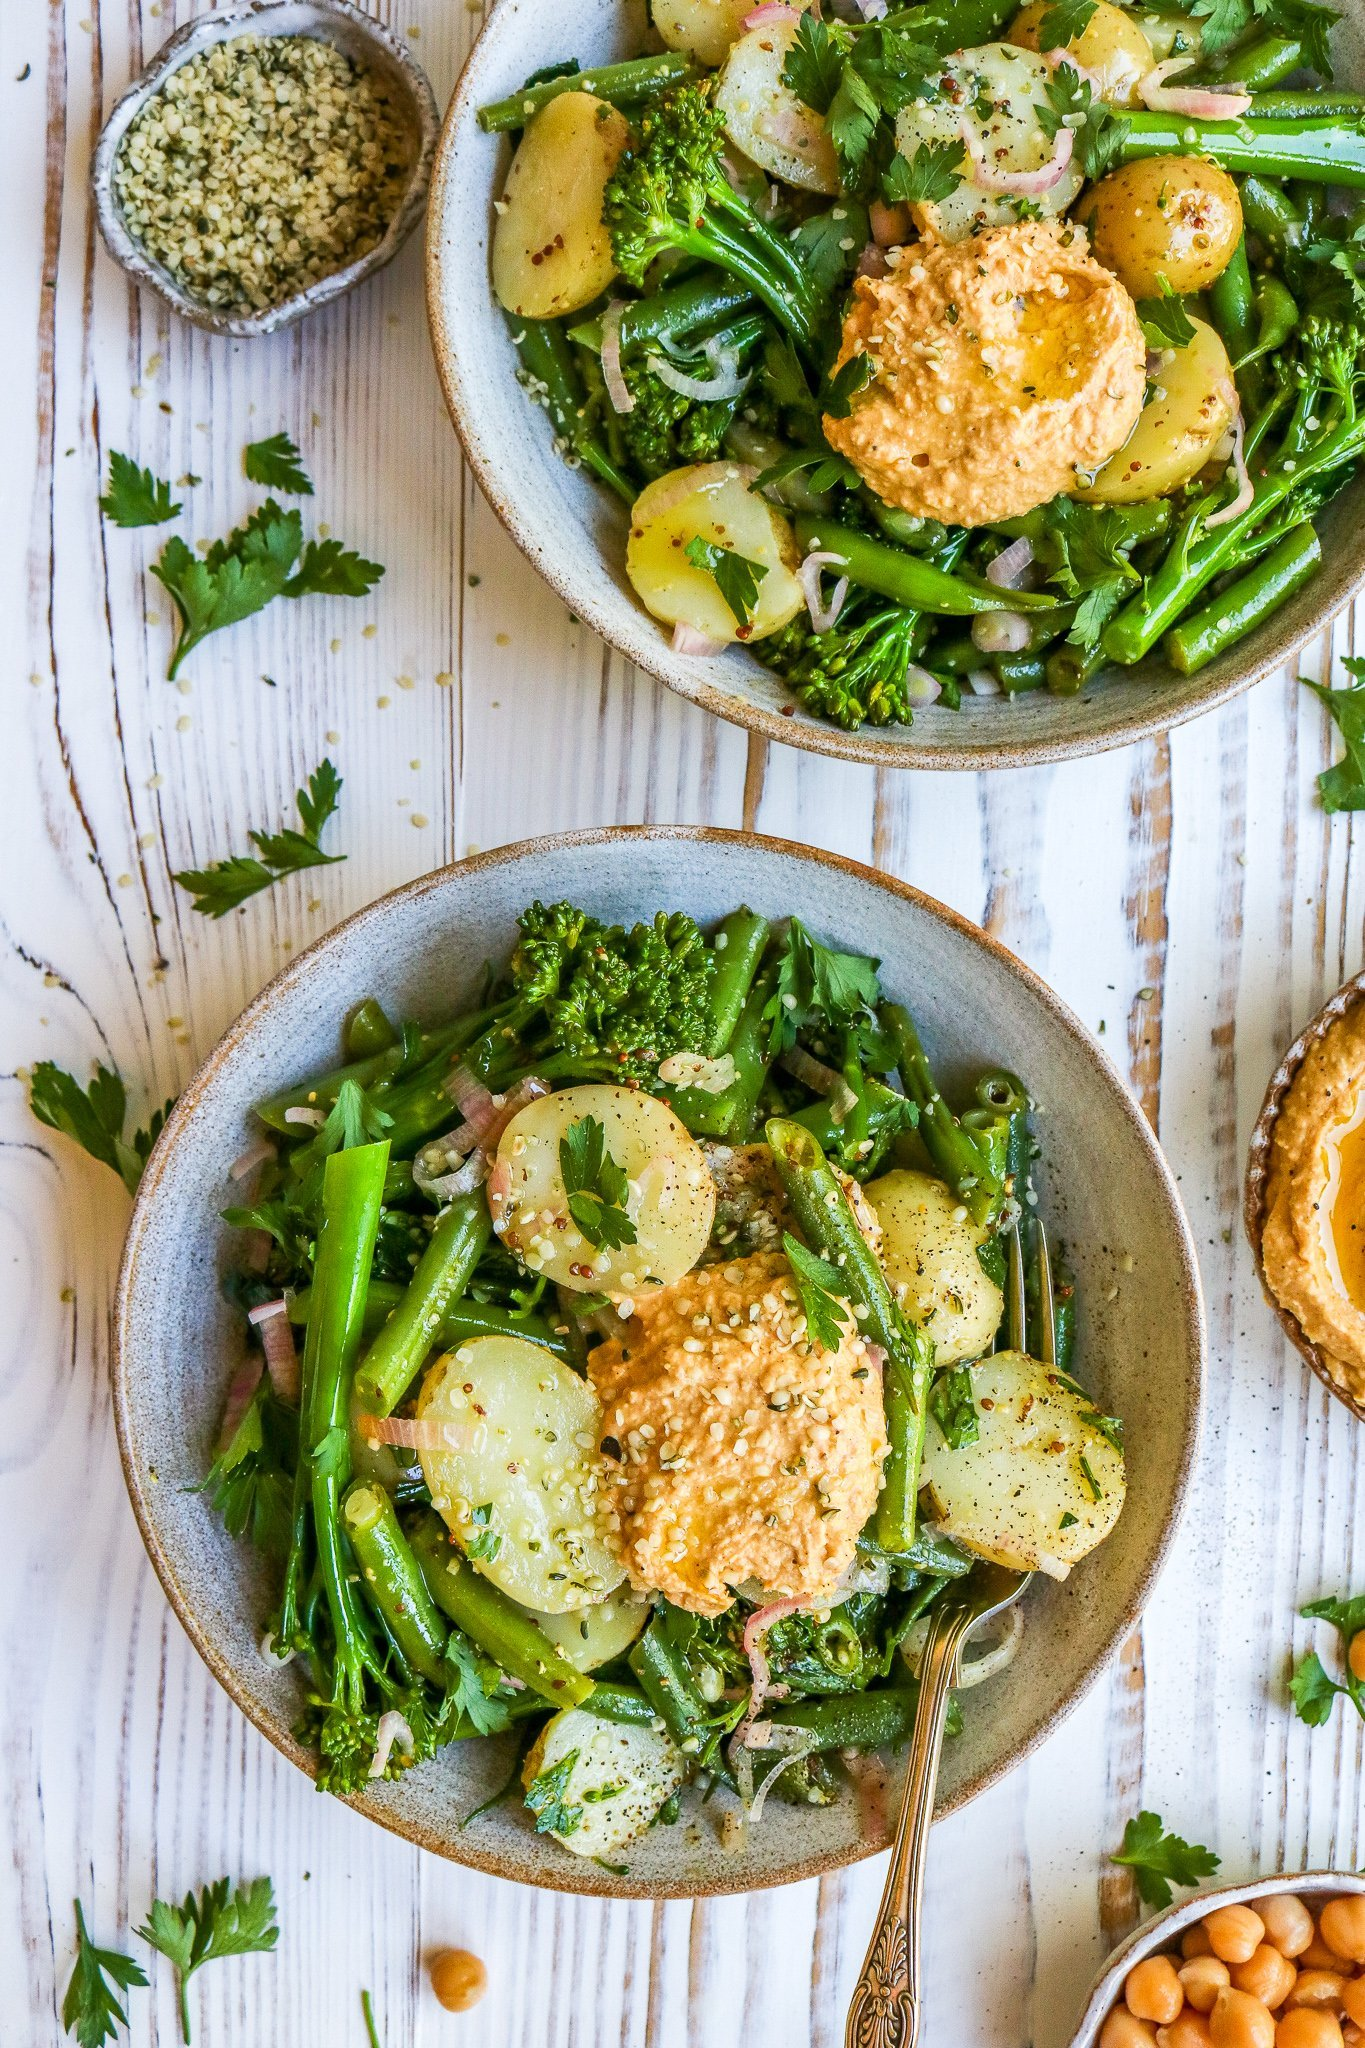 Summer Potato Salad with Sweet Pepper Hummus